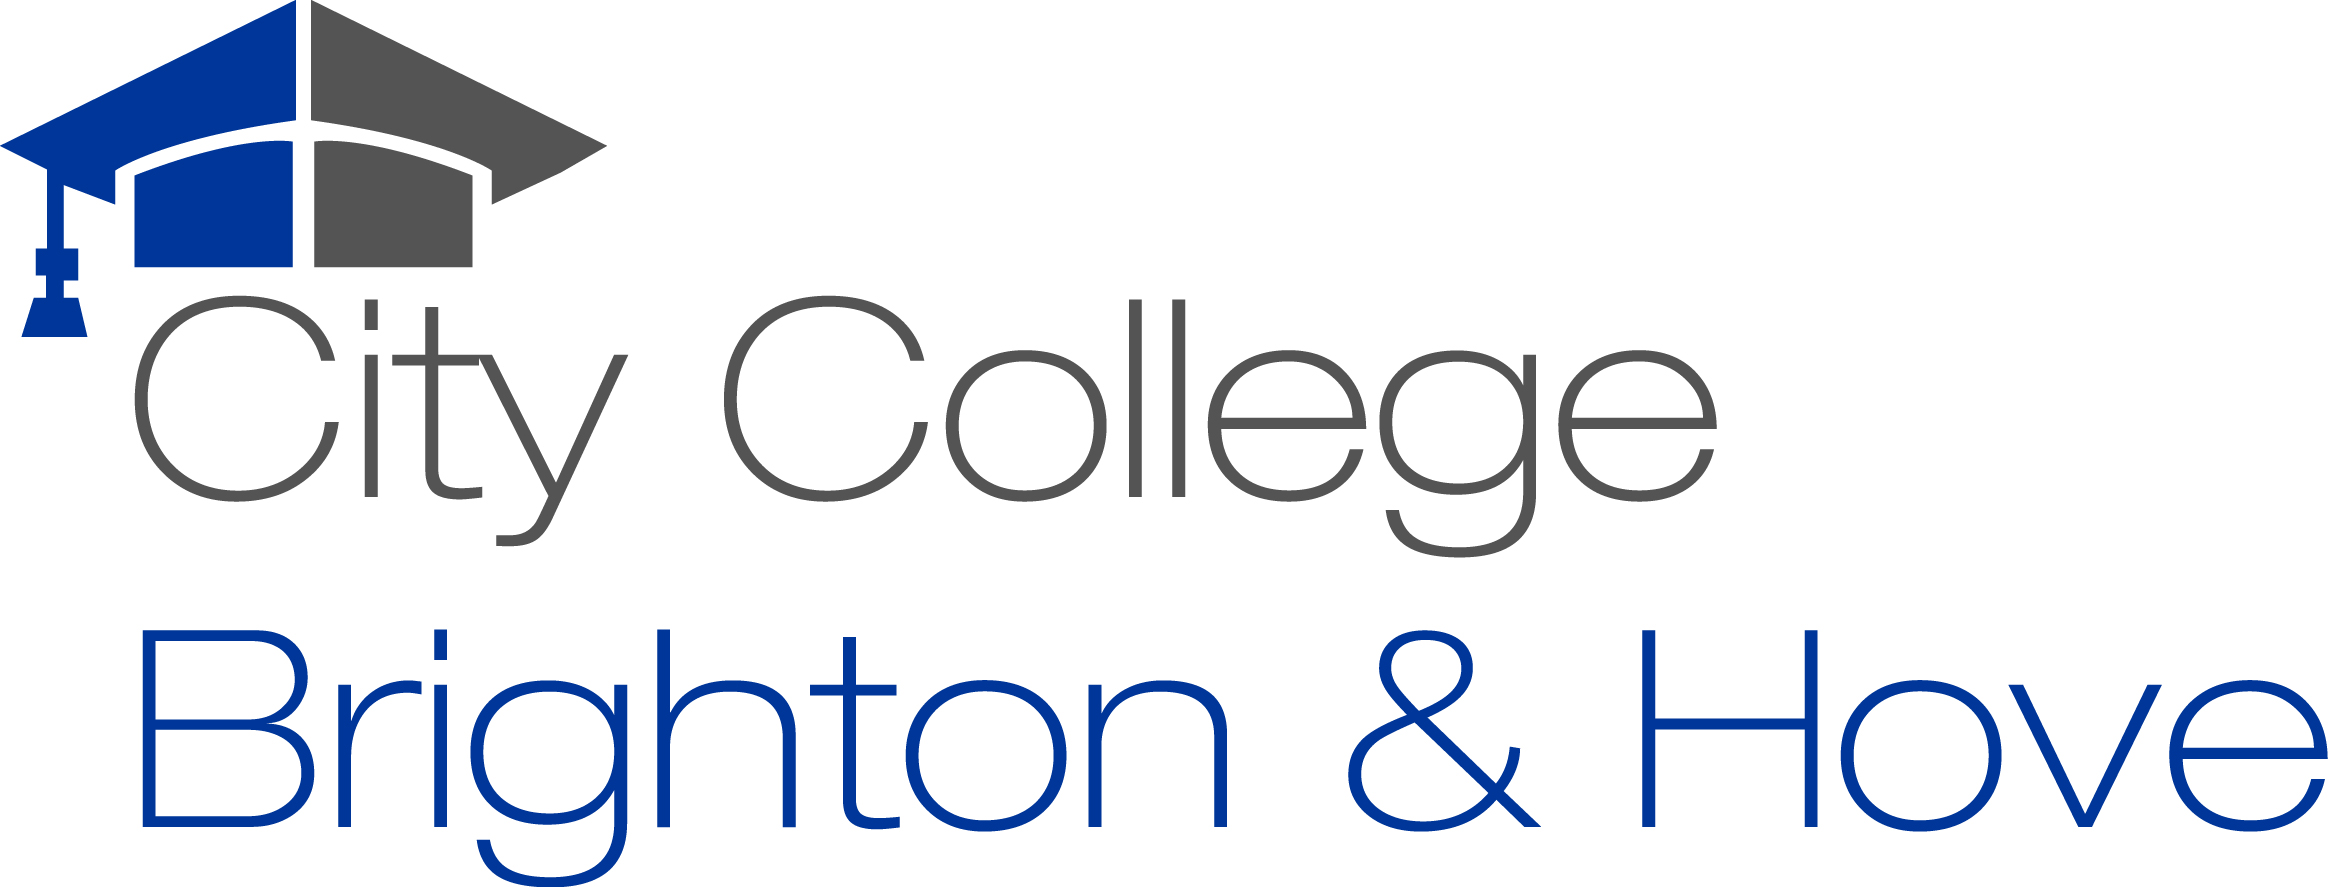 Logo Design for City College Brighton and Hove by StudioQ Branding ...